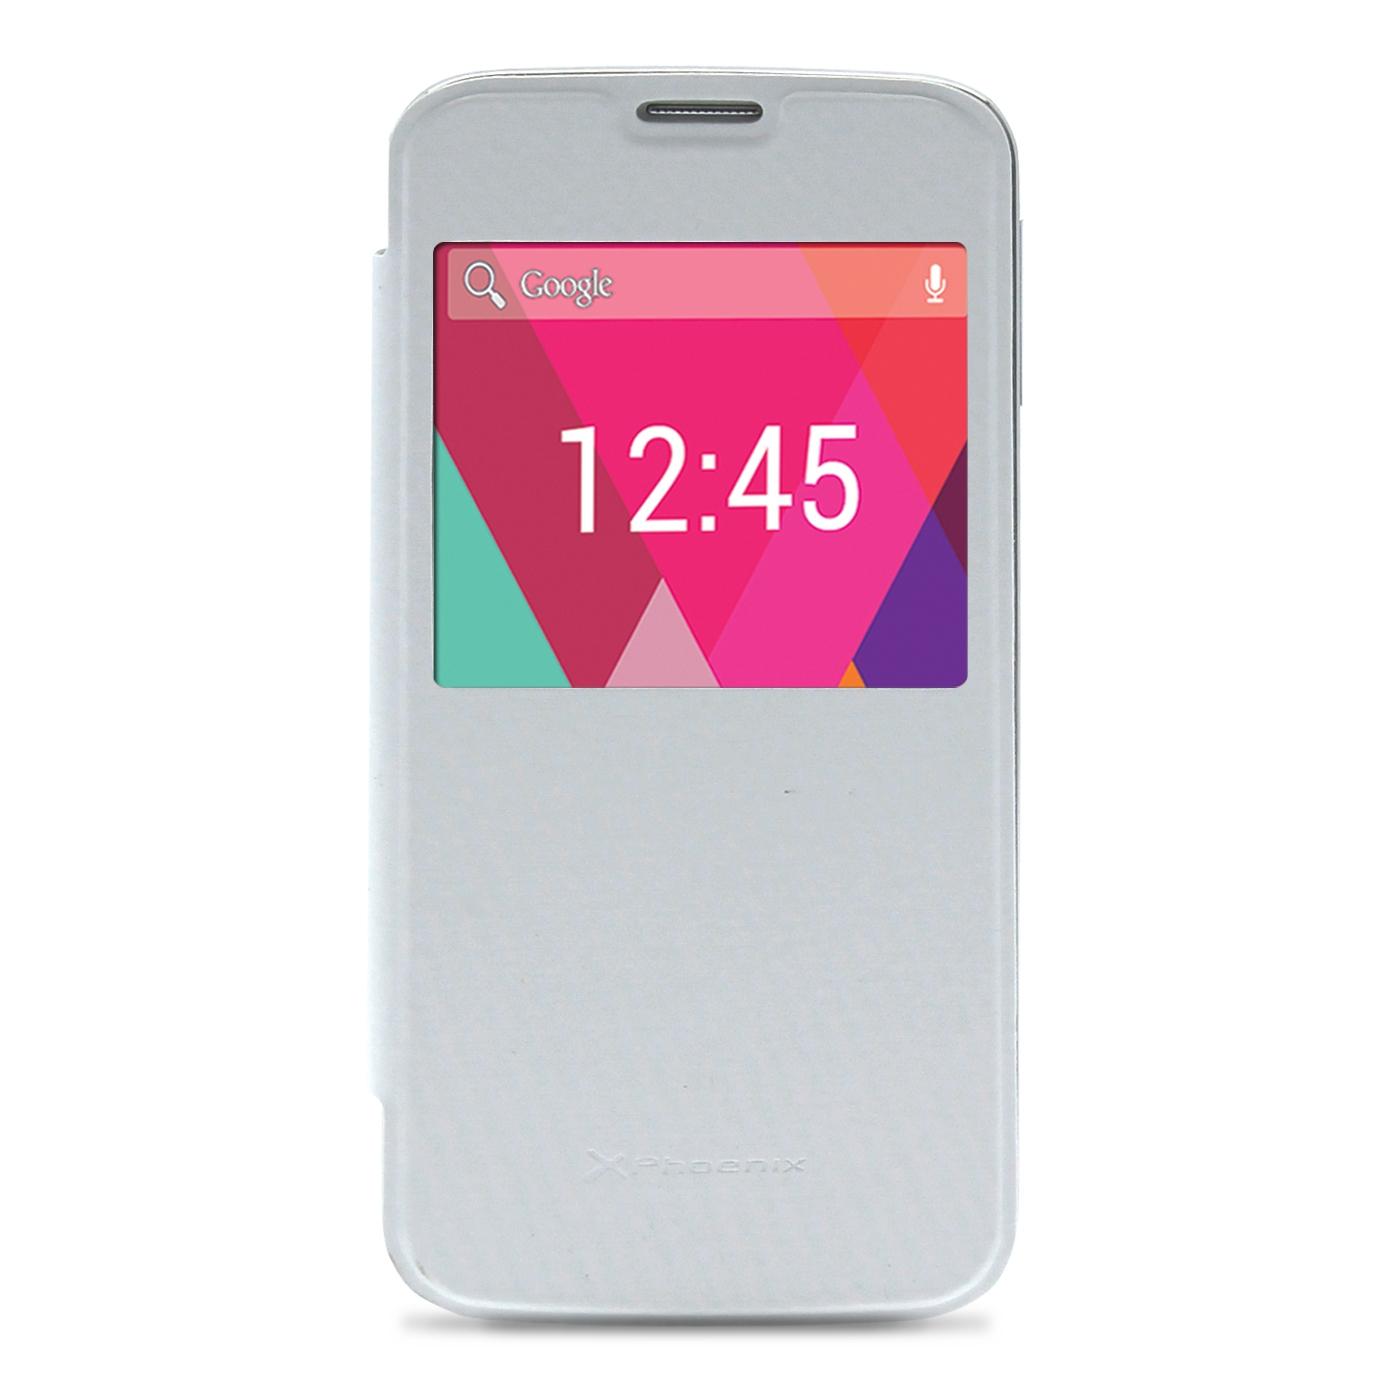 Funda Slim Cover Case  Phoenix Para Telefono Smartphone  Phrockx1 5 Pulgadasblanco PHROCKX1SLIMCASEW